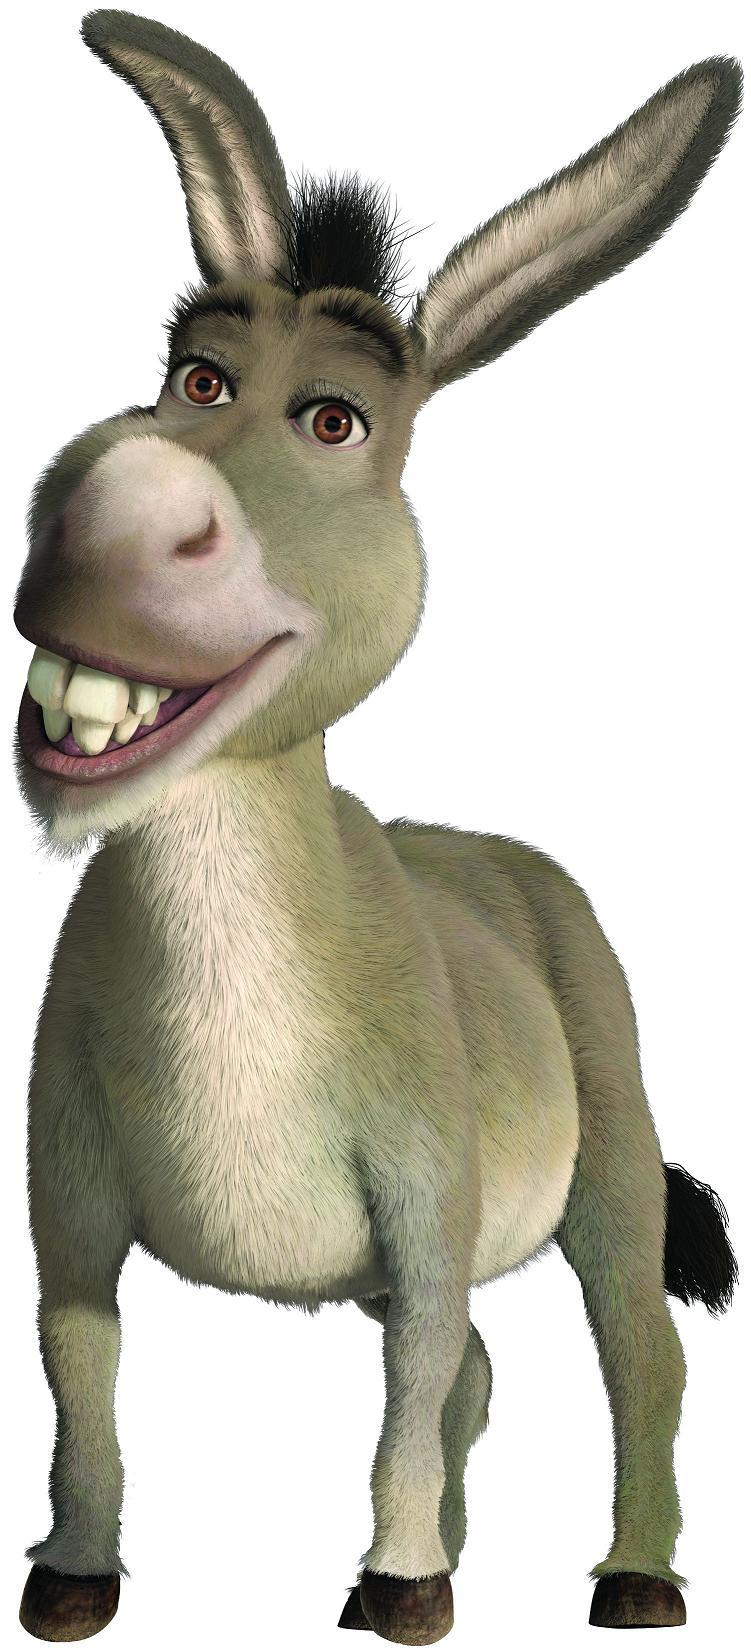 Asno Burro Shrek Wiki Fandom